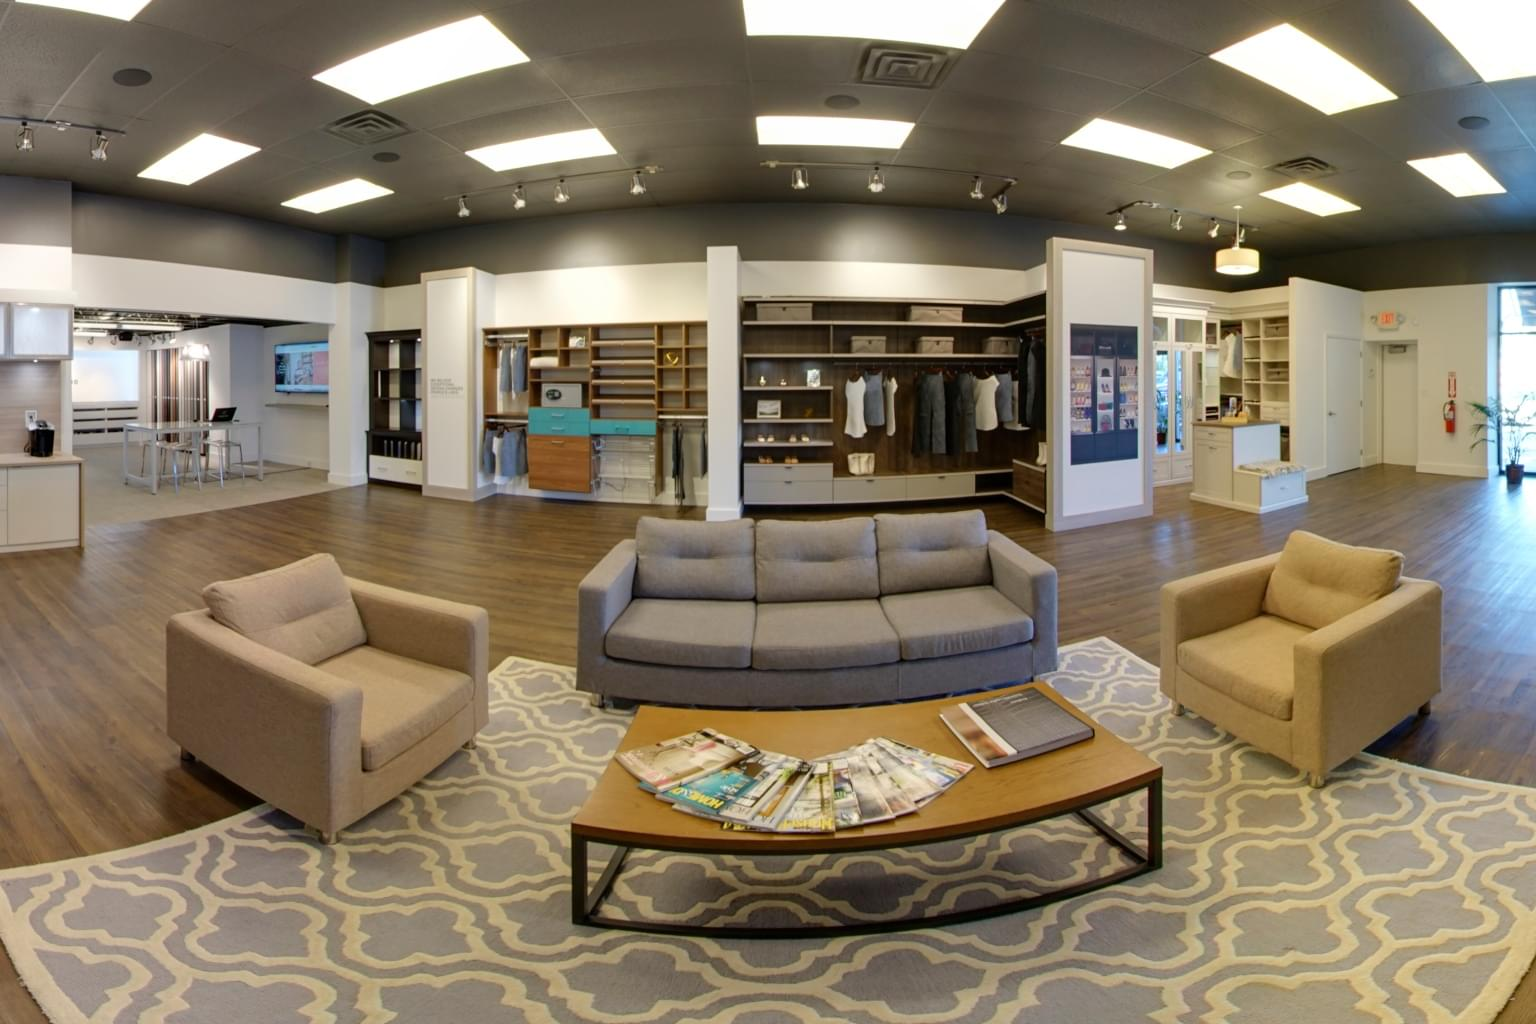 California closets ellicott city md see inside for Interior design 08003